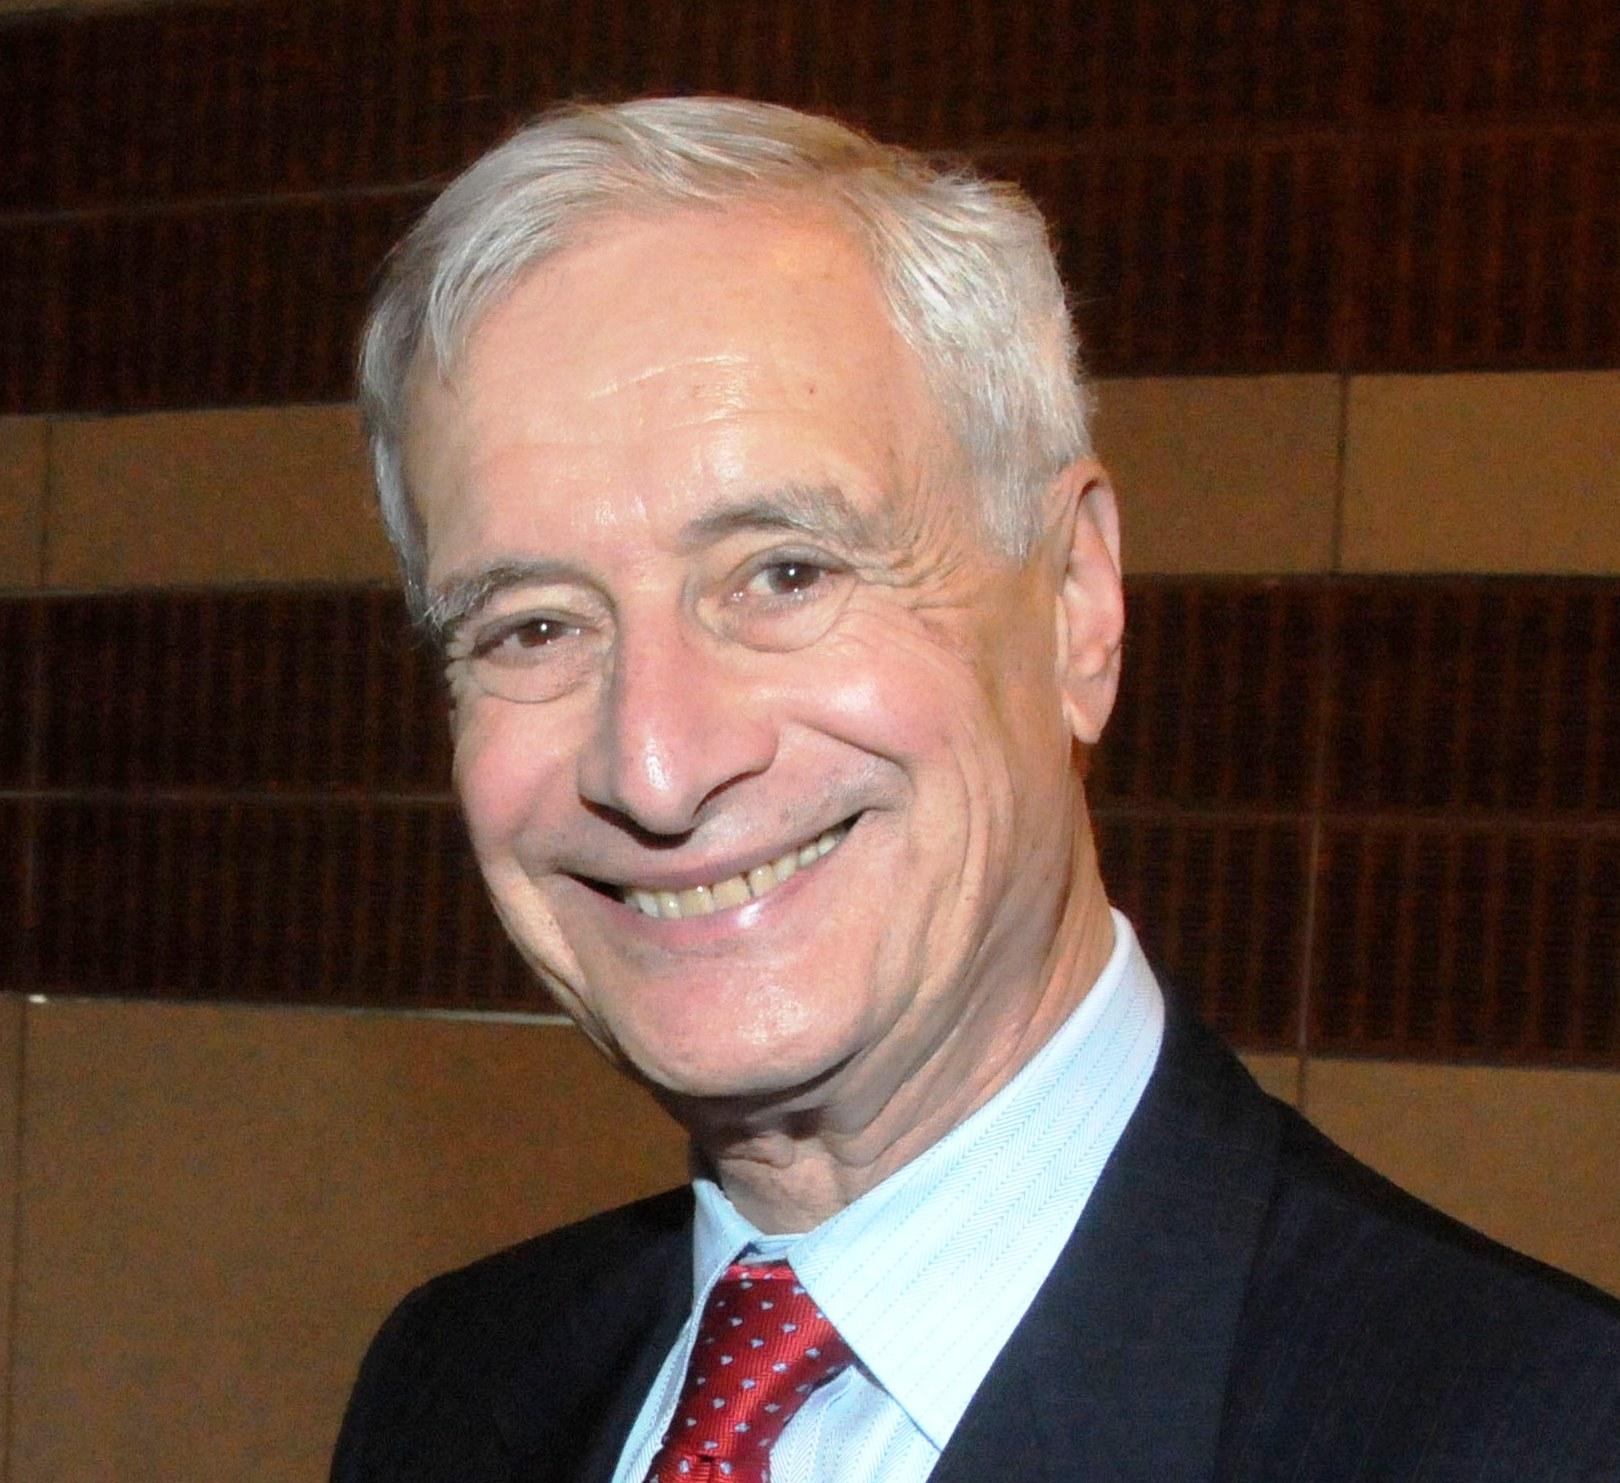 Robert S. Kaplan